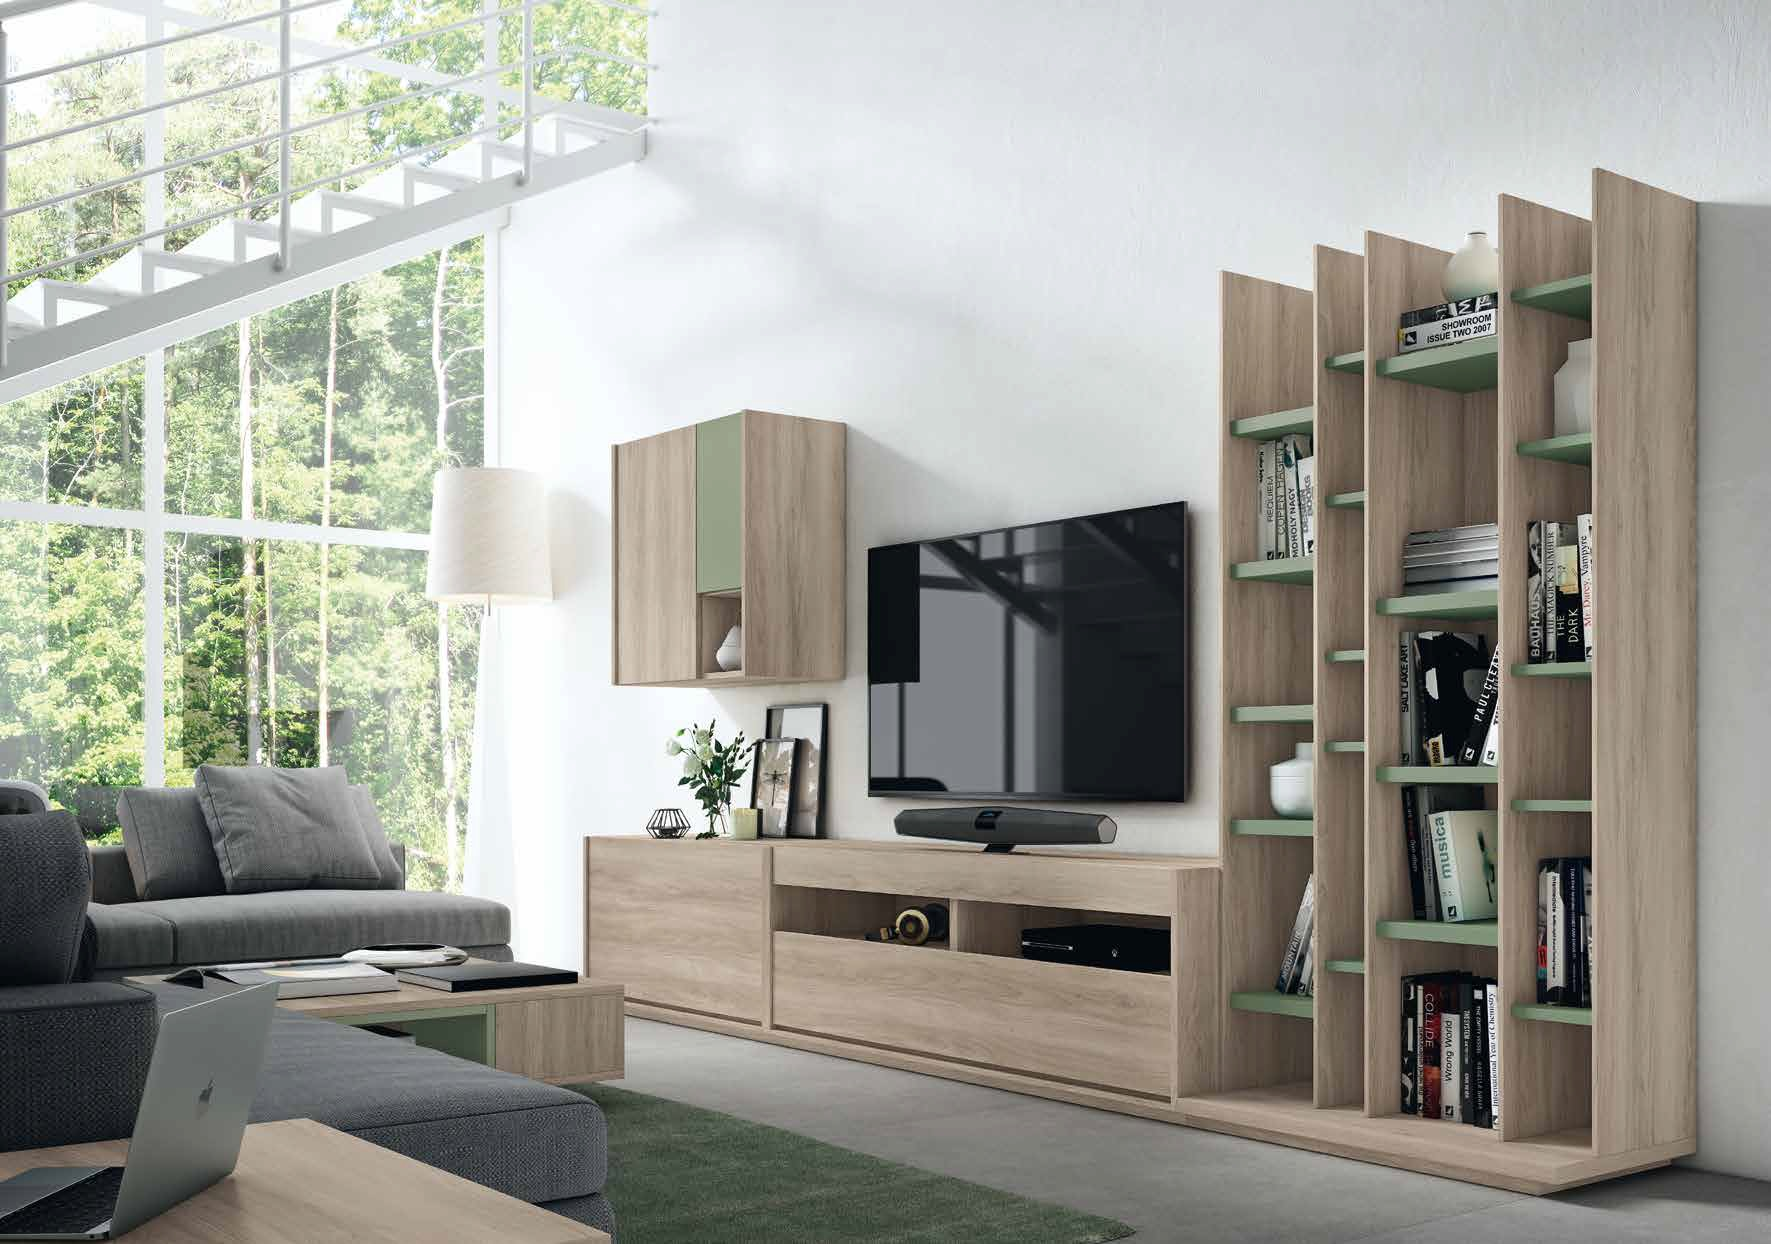 salon-moderno-Nativ-2019-muebles-paco-caballero-0920-5c8ceab36652f